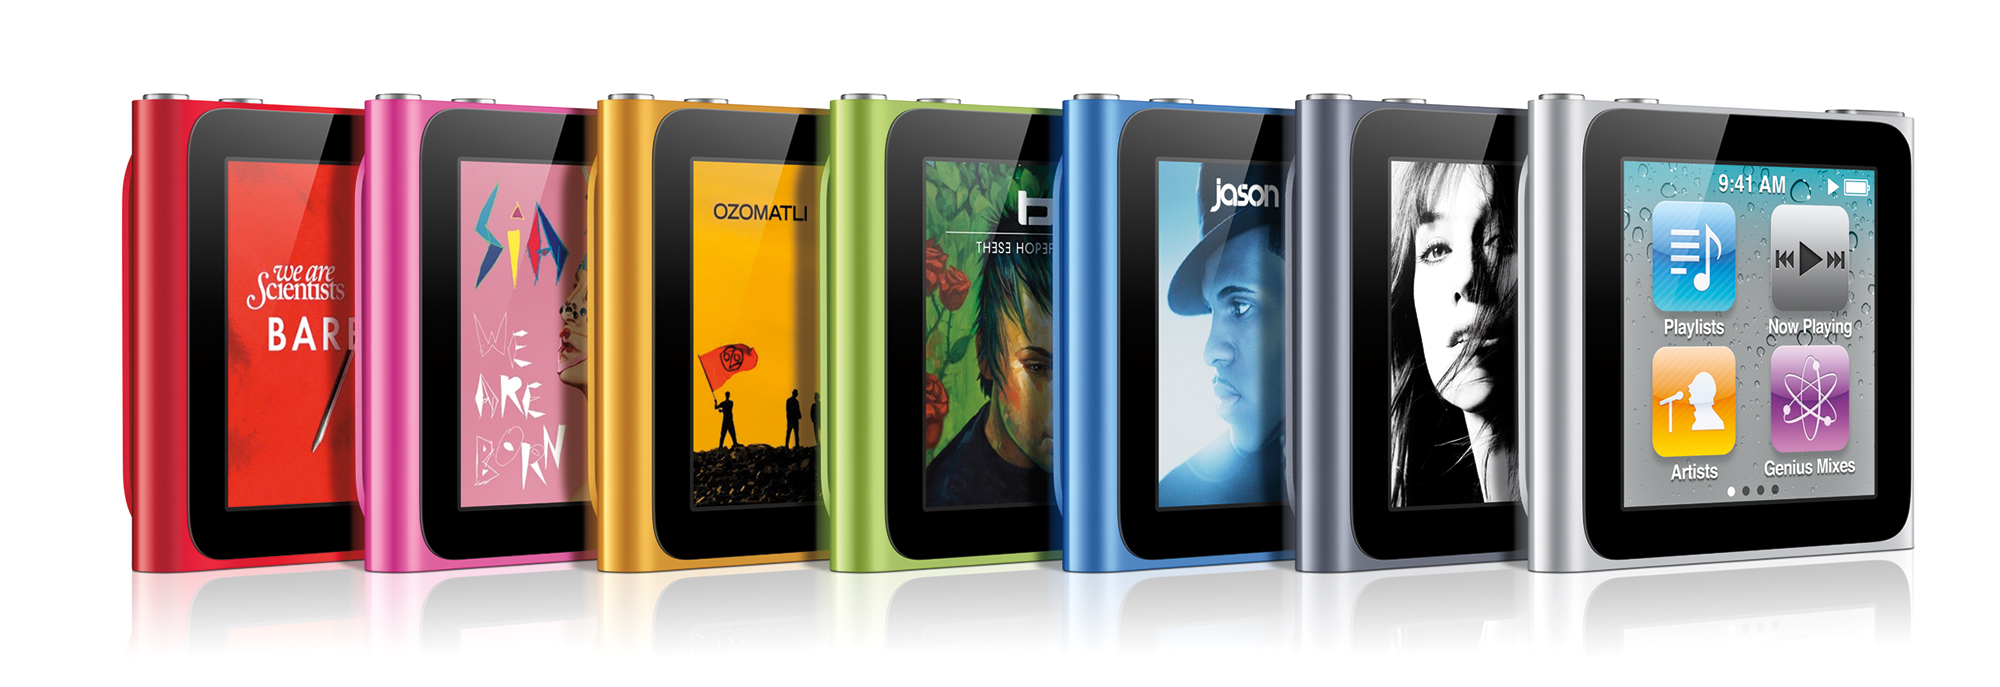 Sixth Generation Ipod Nano Marked Obsolete 512 Pixels